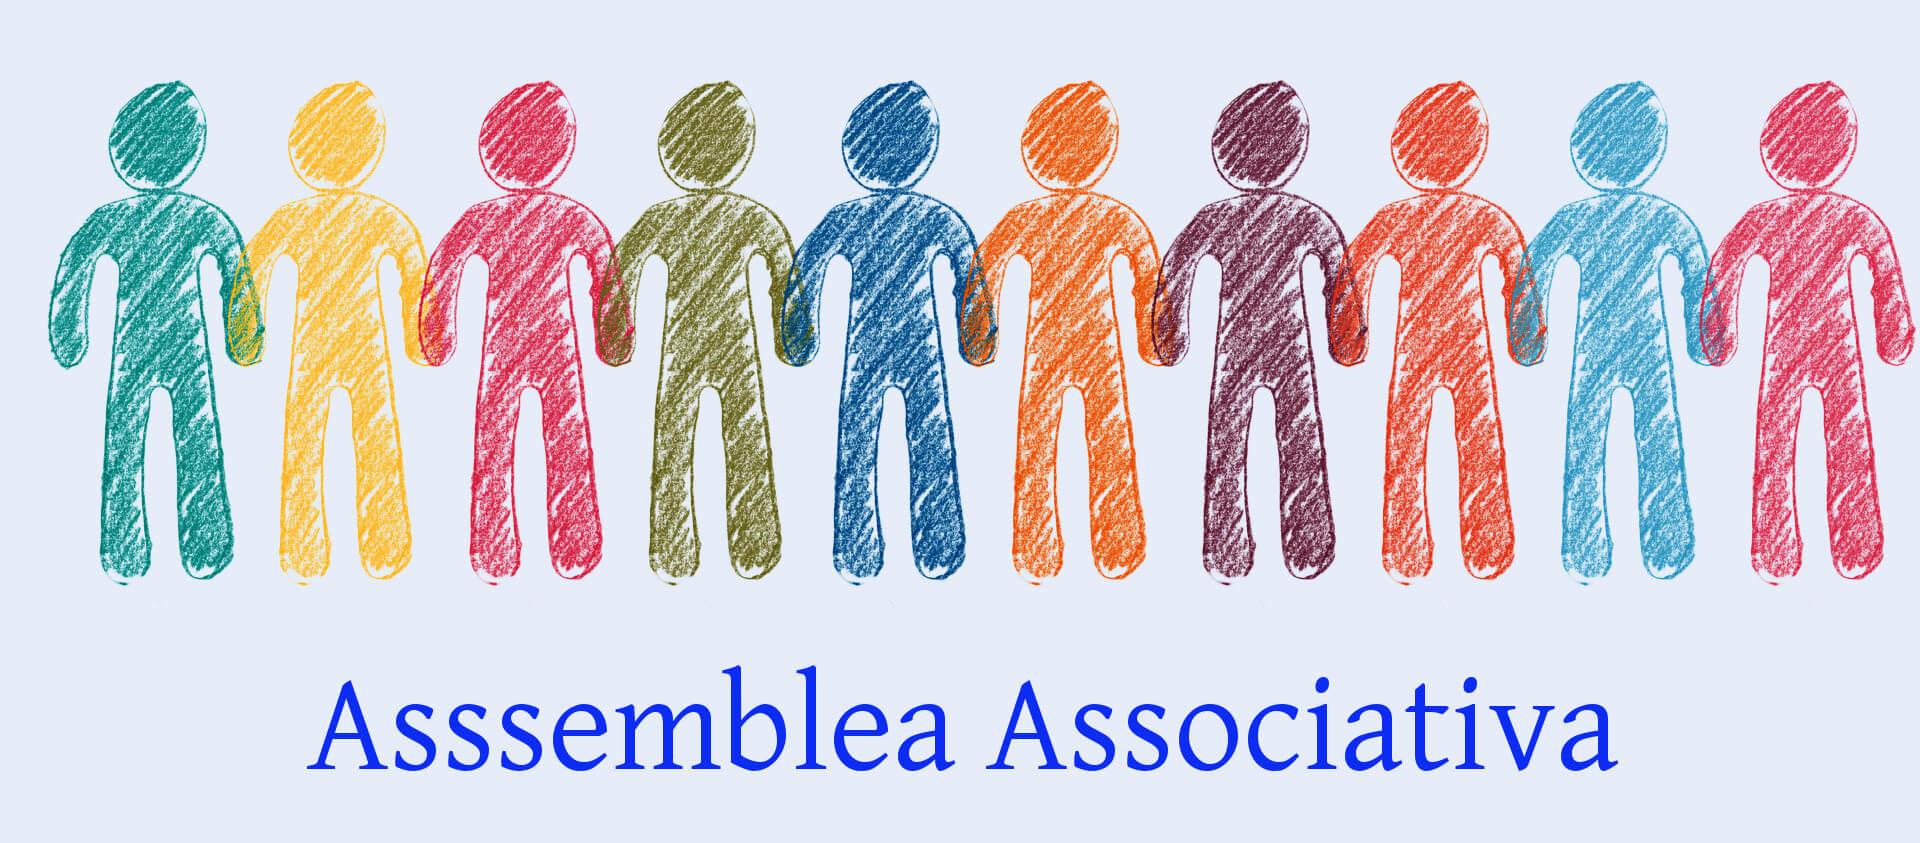 assemblea associativa